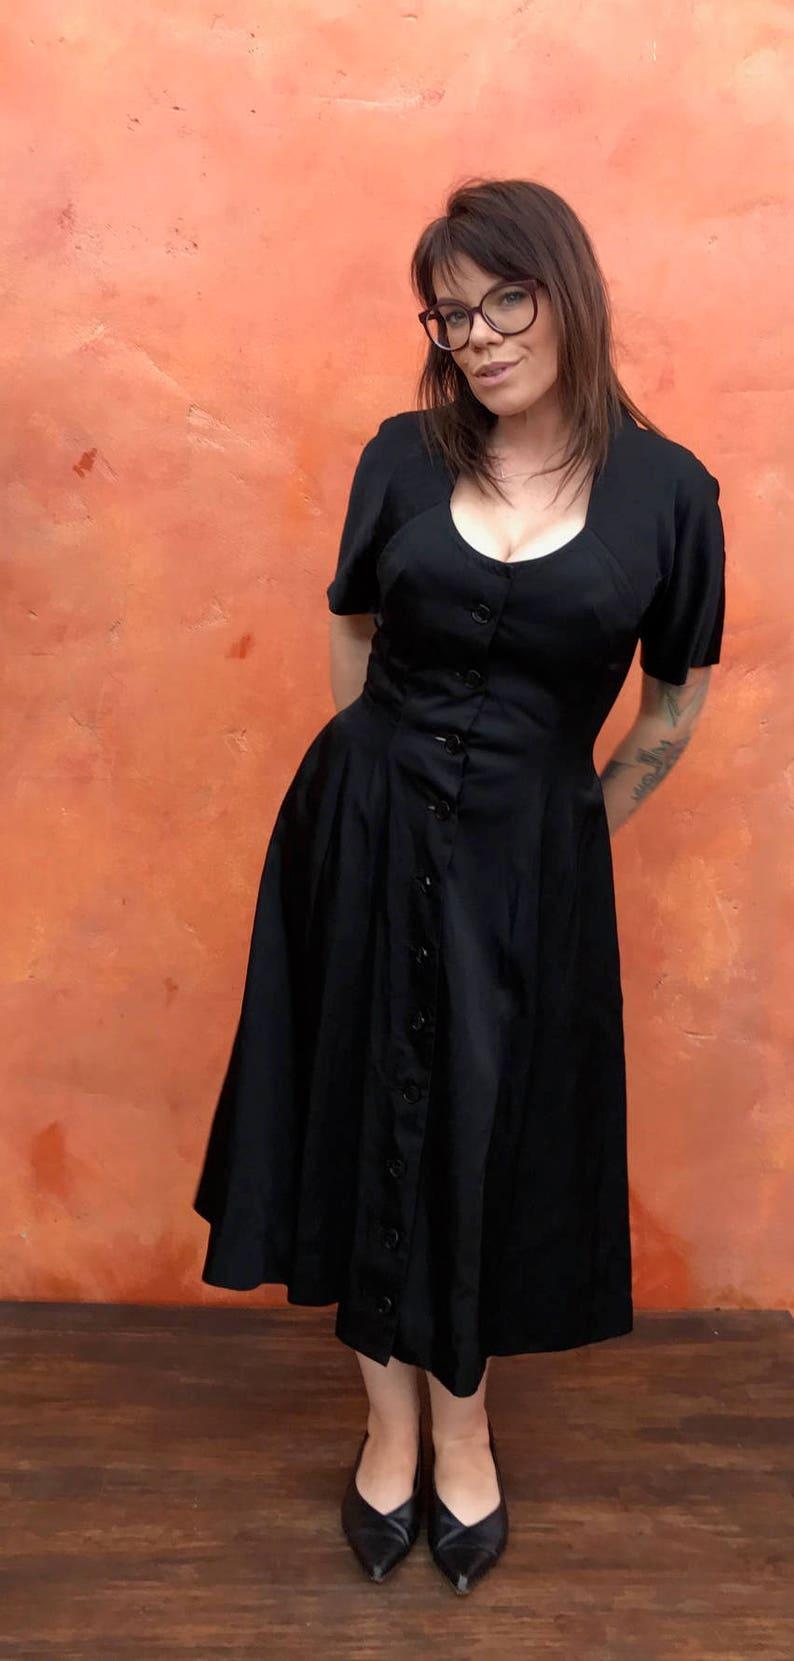 0e7186e66beec Vintage 1950s Black Swing Dress. retro rockabilly pinup | Etsy